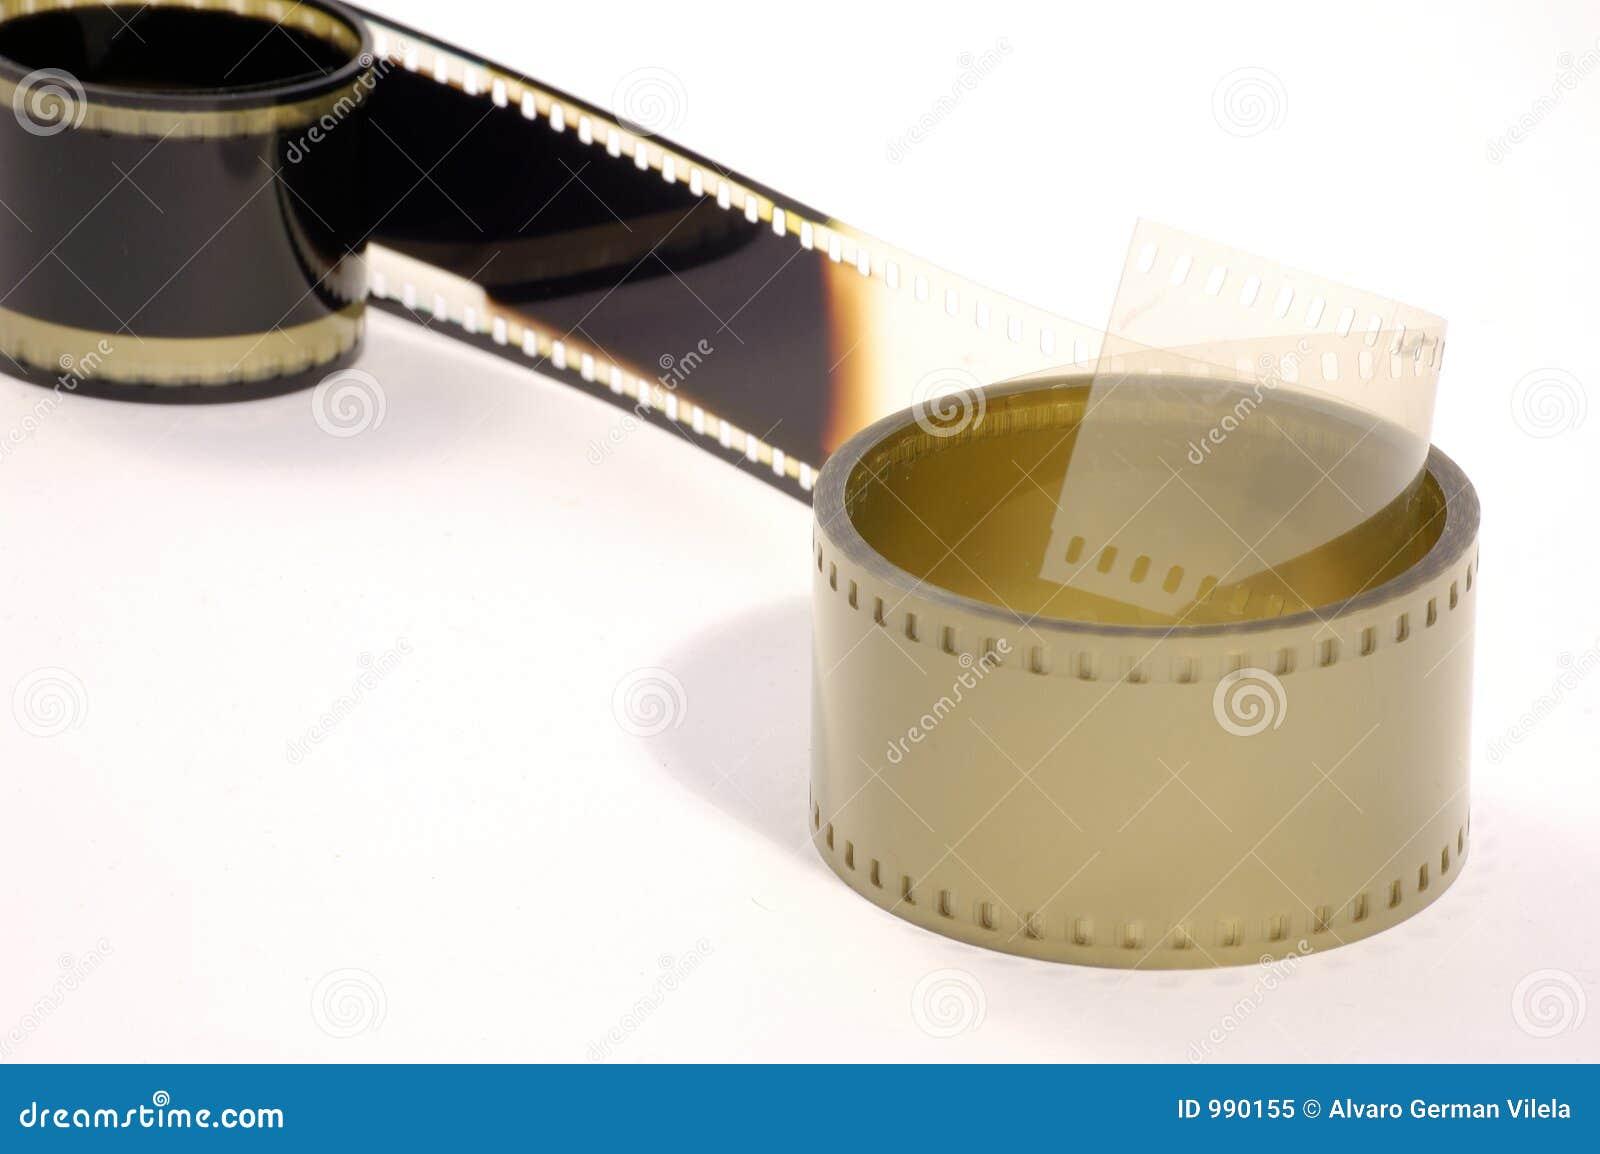 Film negative roll